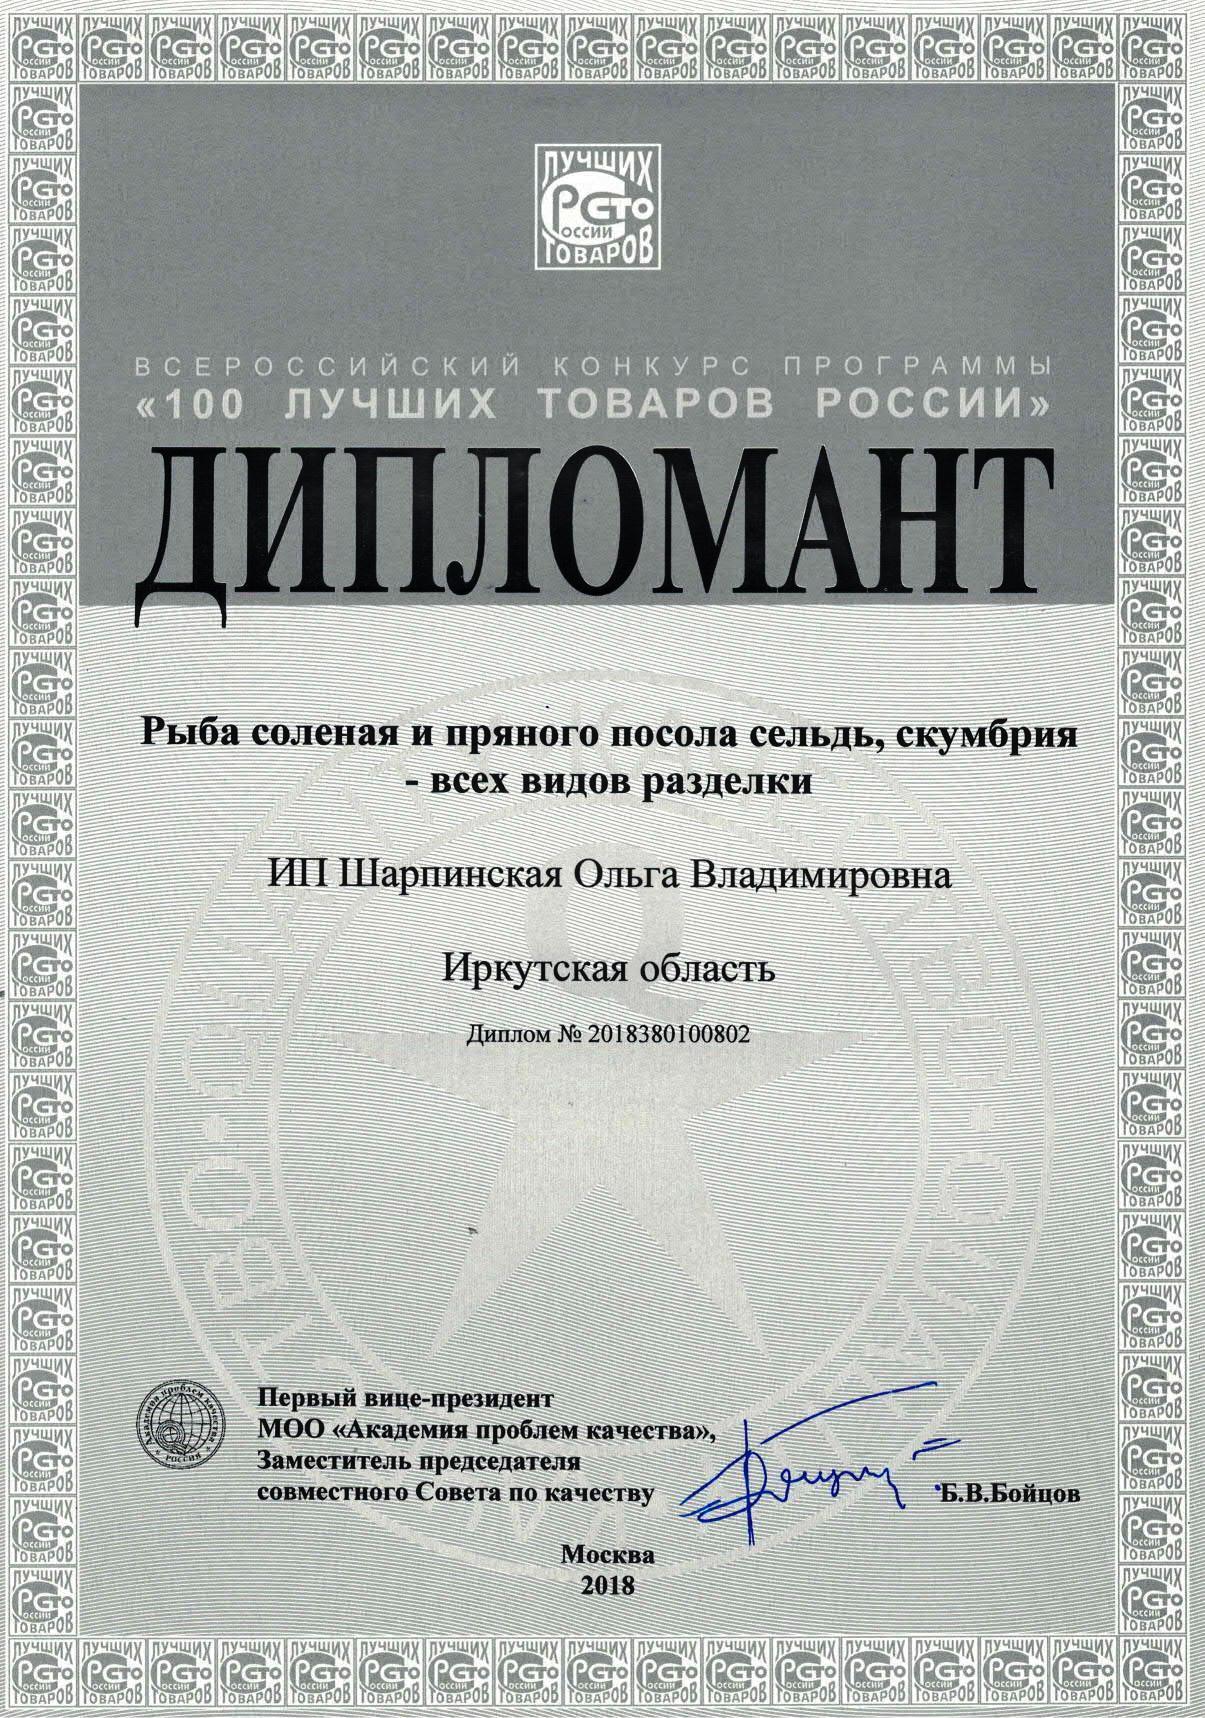 дипломант рыба соленая 100 ЛТР 2018 1